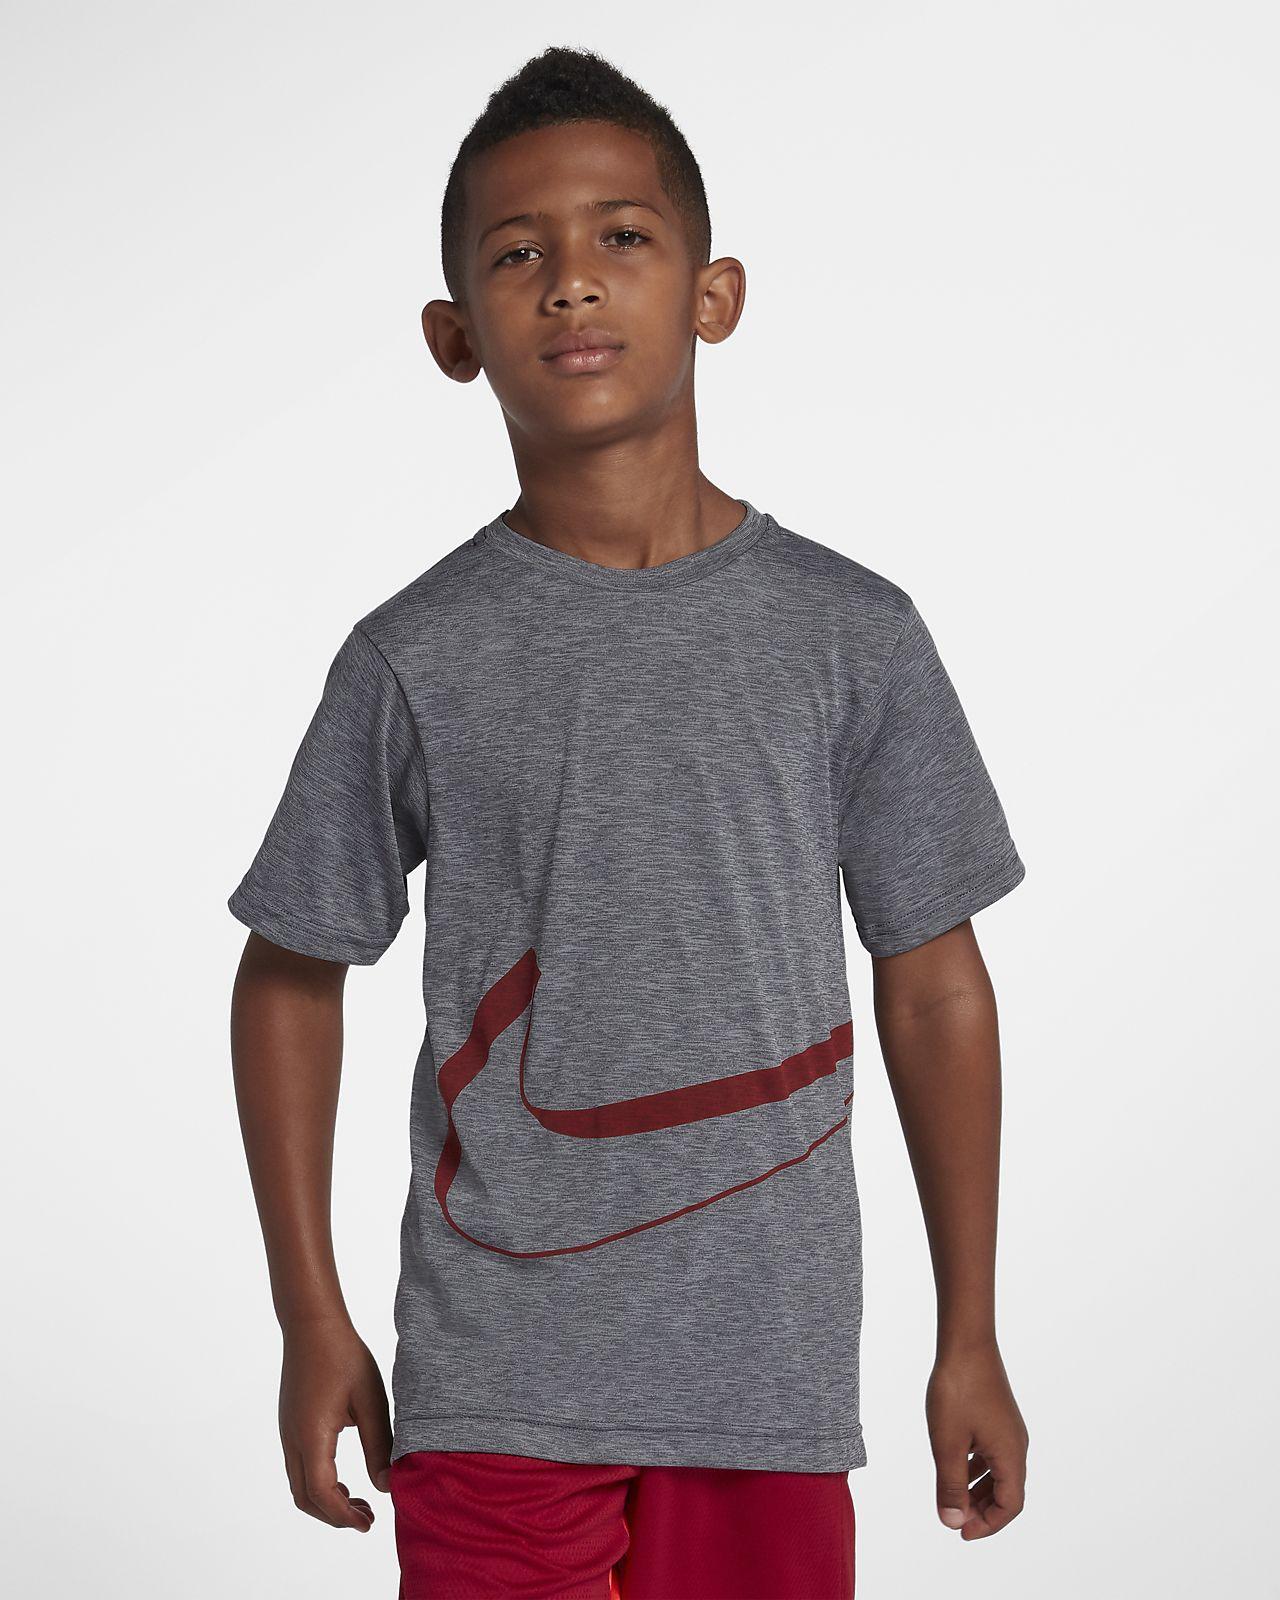 6f6b294b70 Nike Dri-FIT Breathe Older Kids  (Boys ) Short-Sleeve Training Top ...